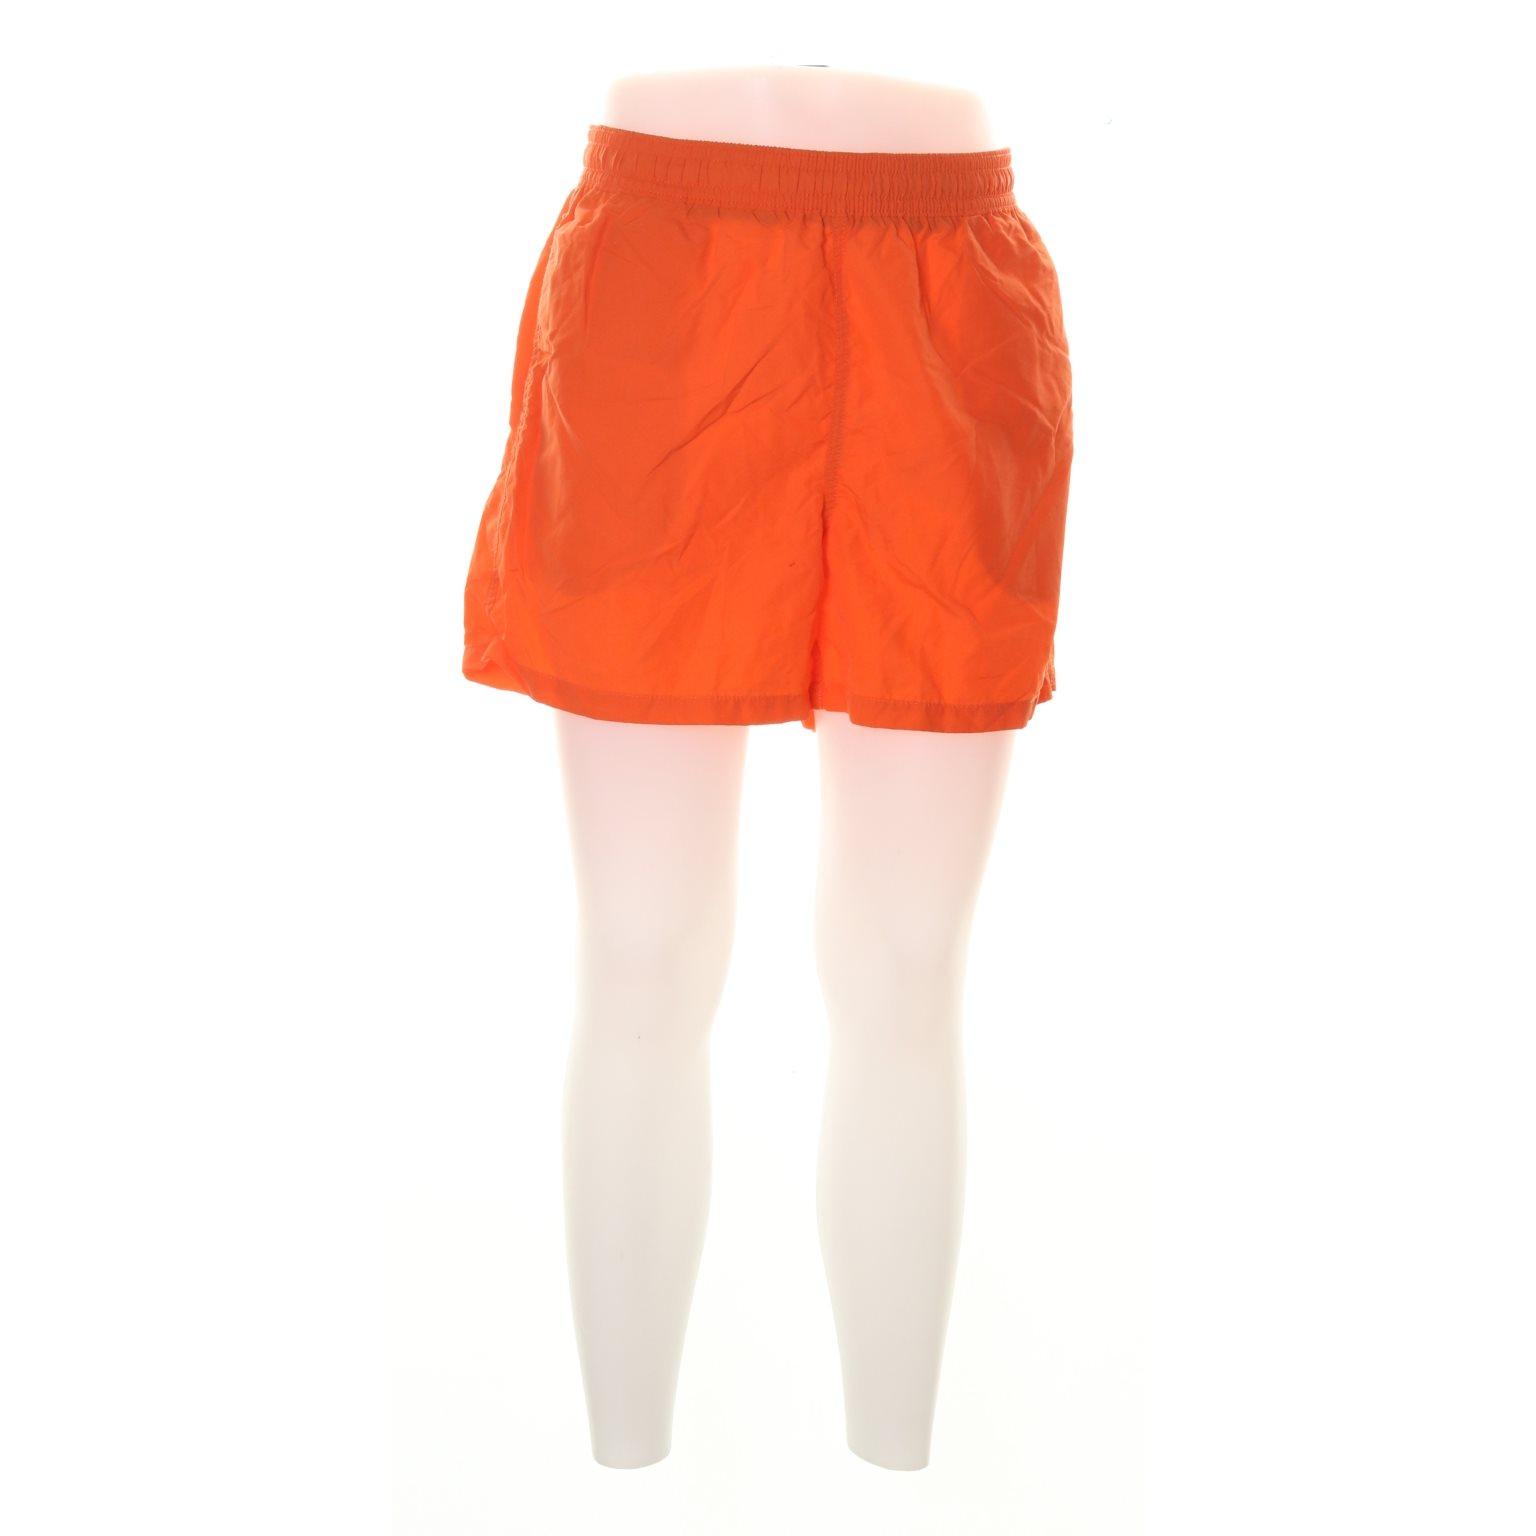 Polo Ralph Lauren, Shorts, Strl: M, Orange